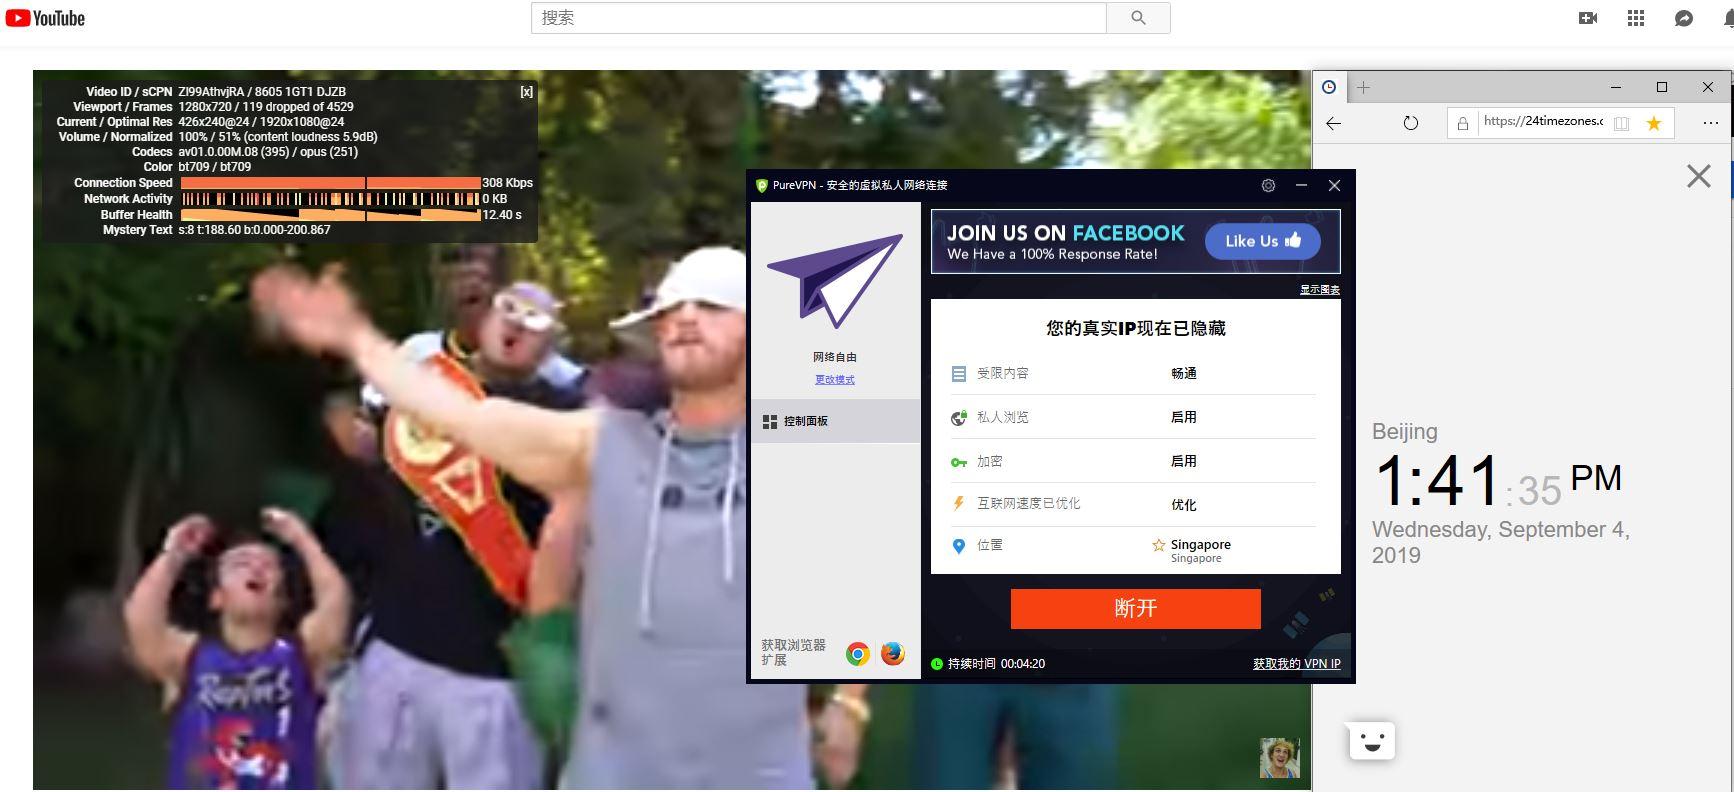 windows Purevpn singapore 中国翻墙 科学上网 YouTube测试-20190904